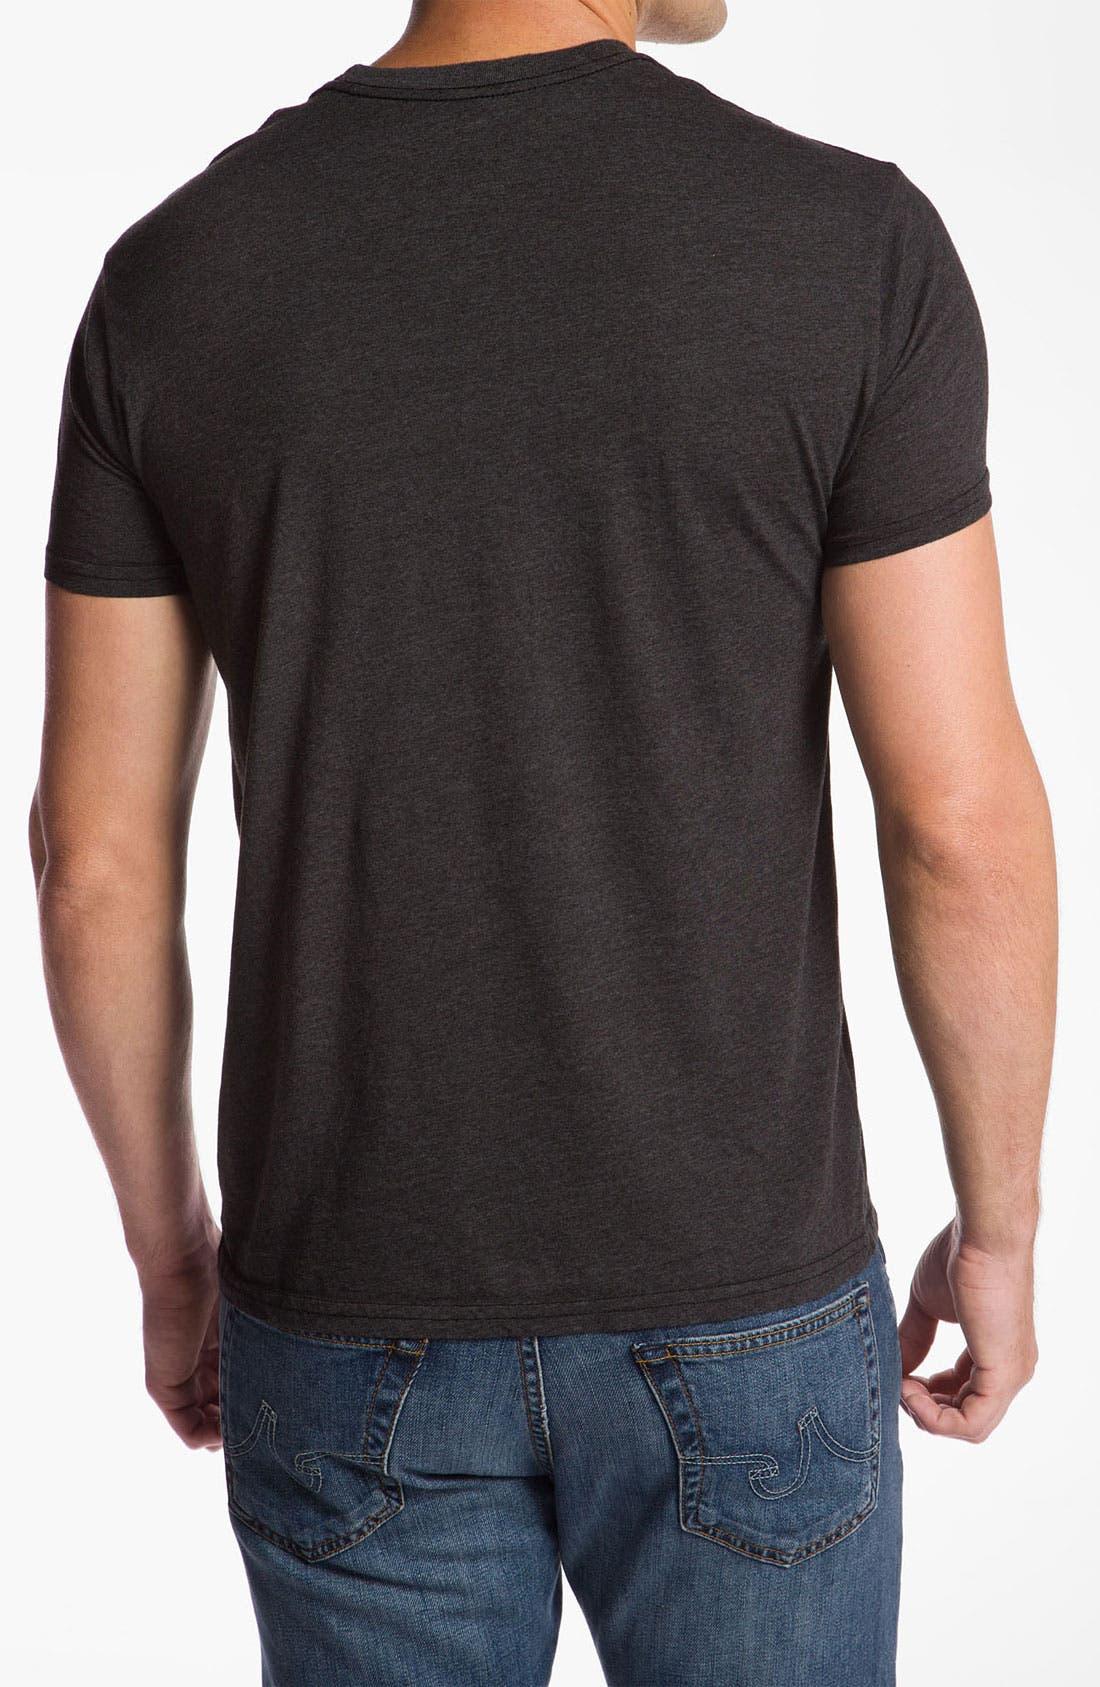 Alternate Image 2  - The Original Retro Brand 'San Diego State' T-Shirt